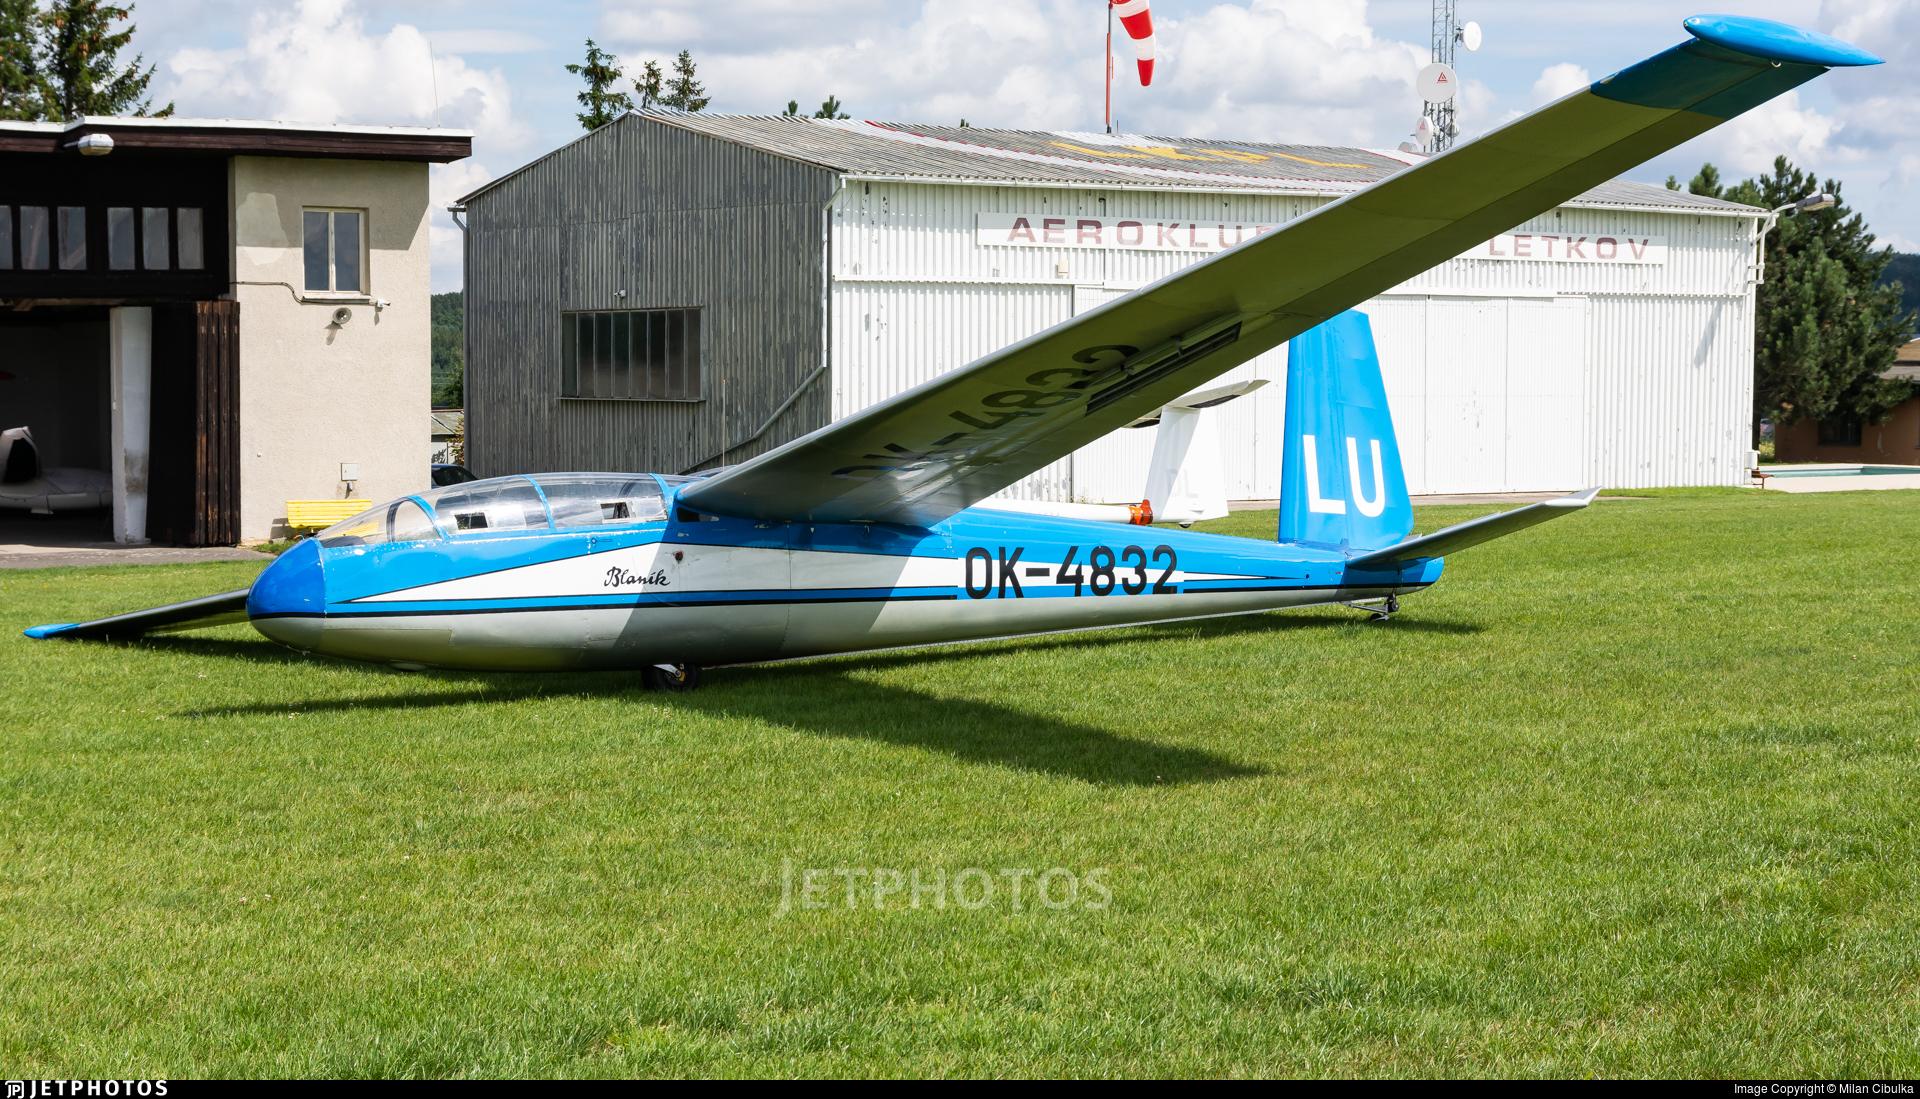 OK-4832 - Let L-13 Blanik - Aero Club - Plze?-Letkov